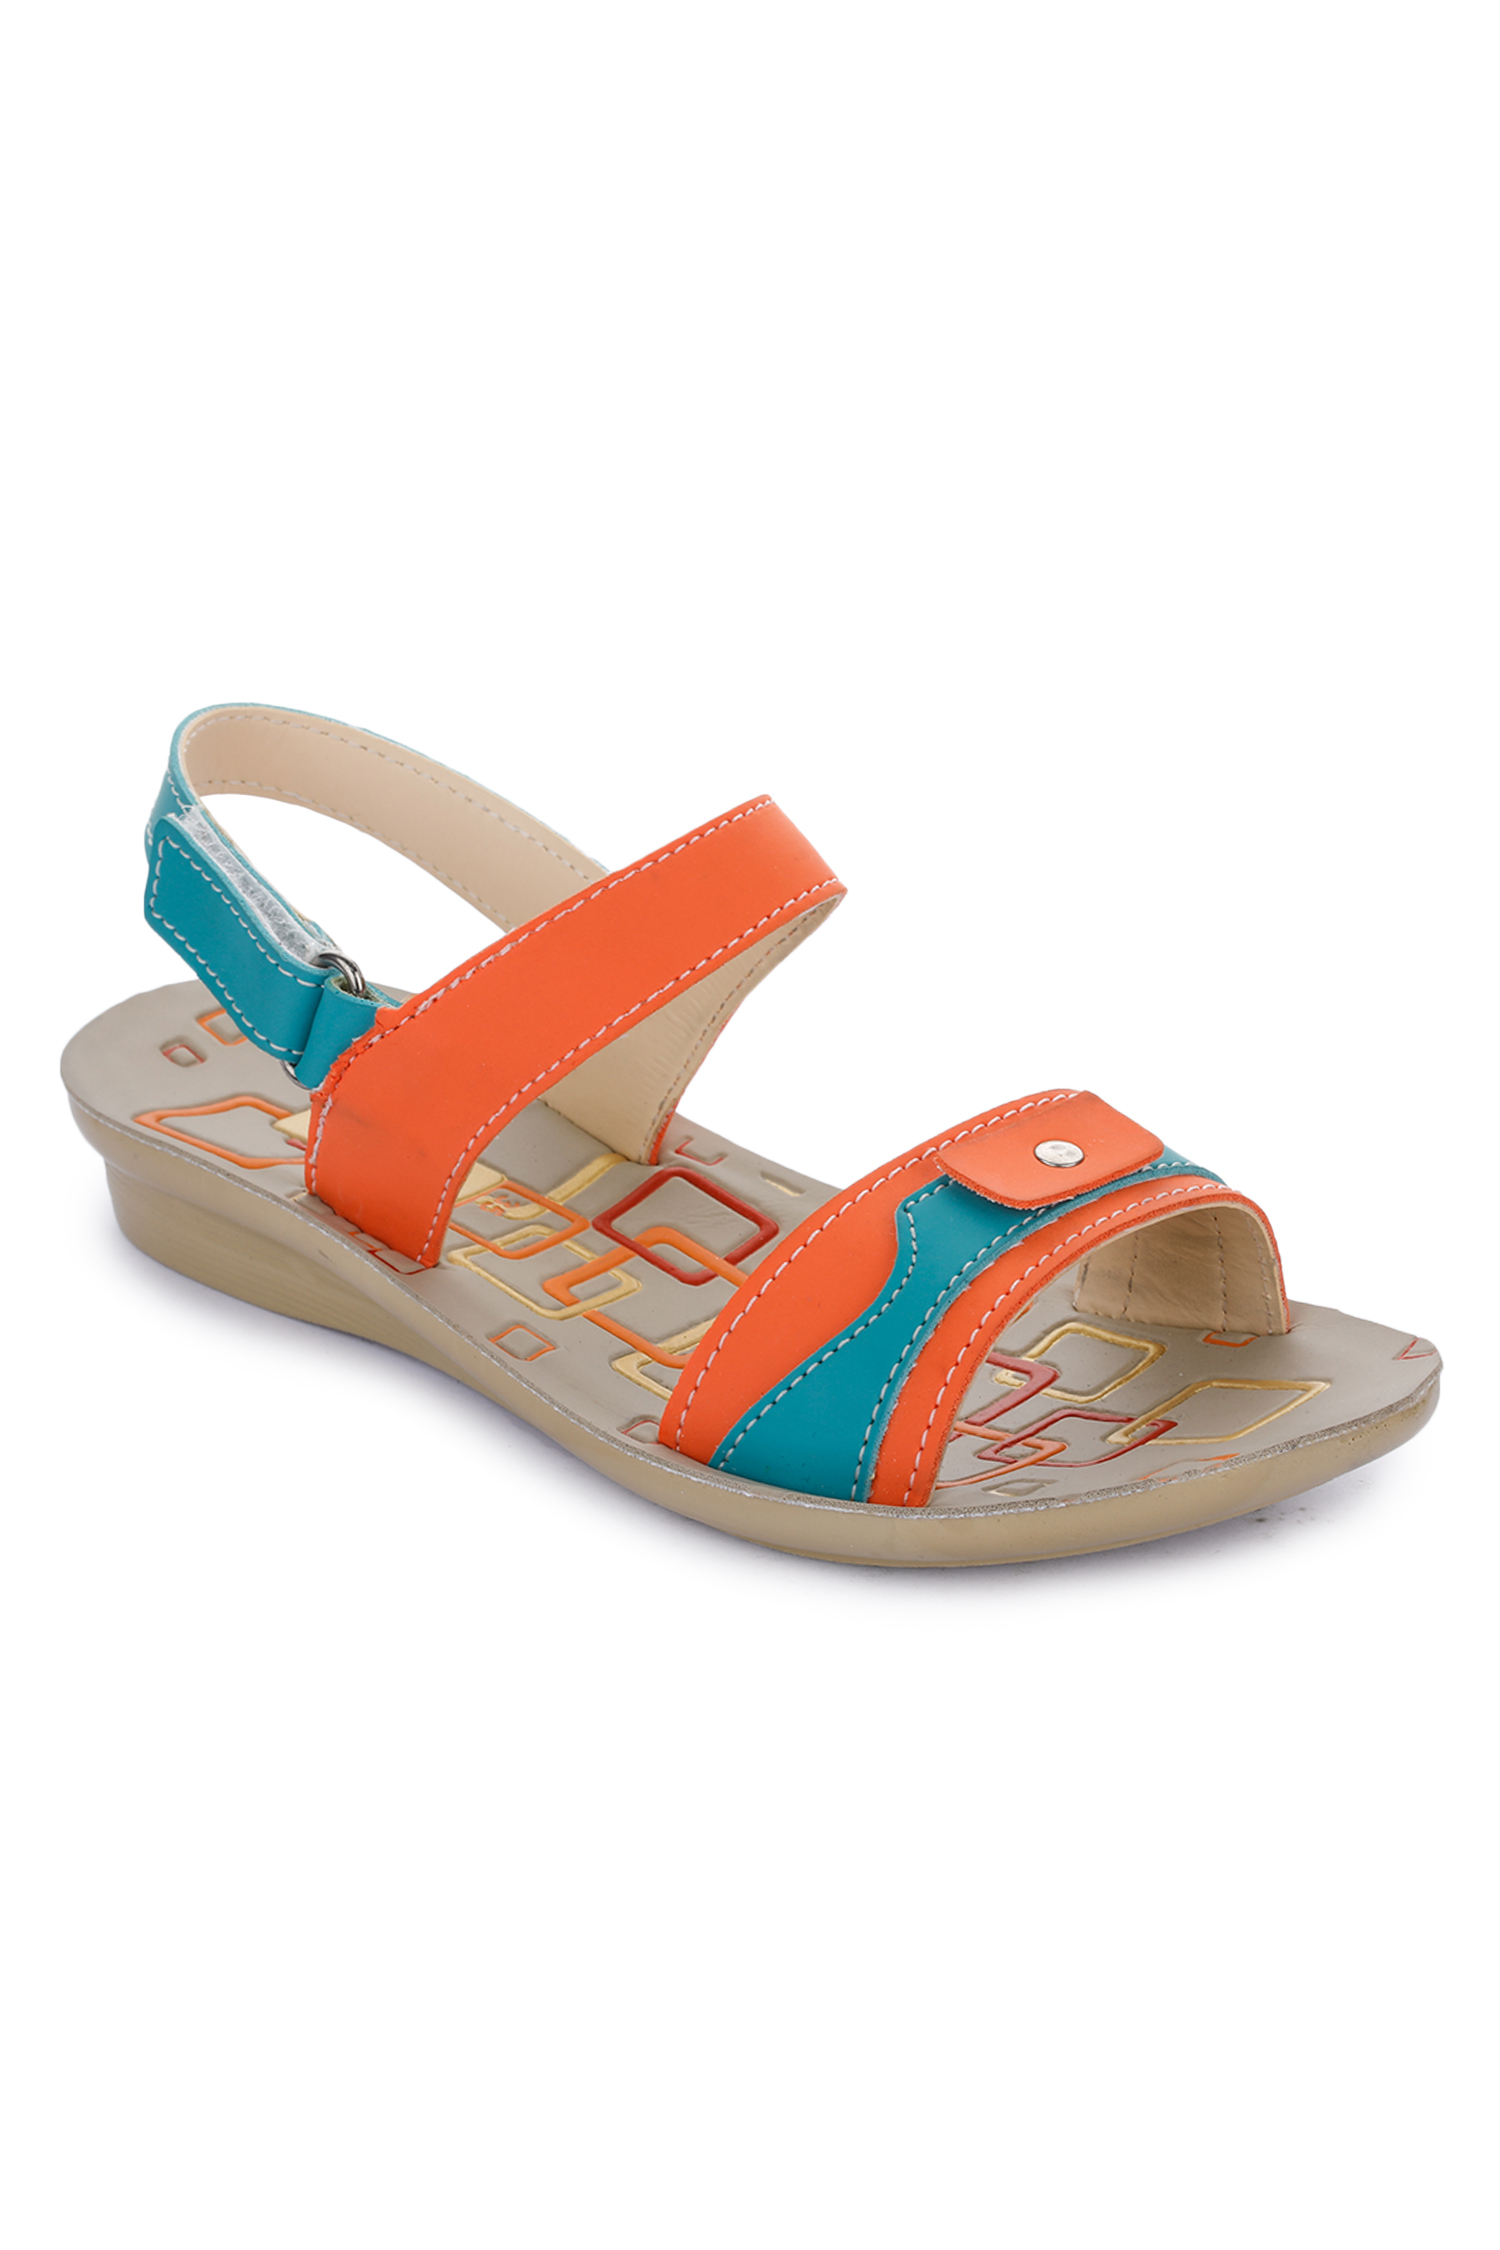 Liberty | Liberty Lucy & Luke Orange Casual Sandals DOLLY-1_Orange For - Boys